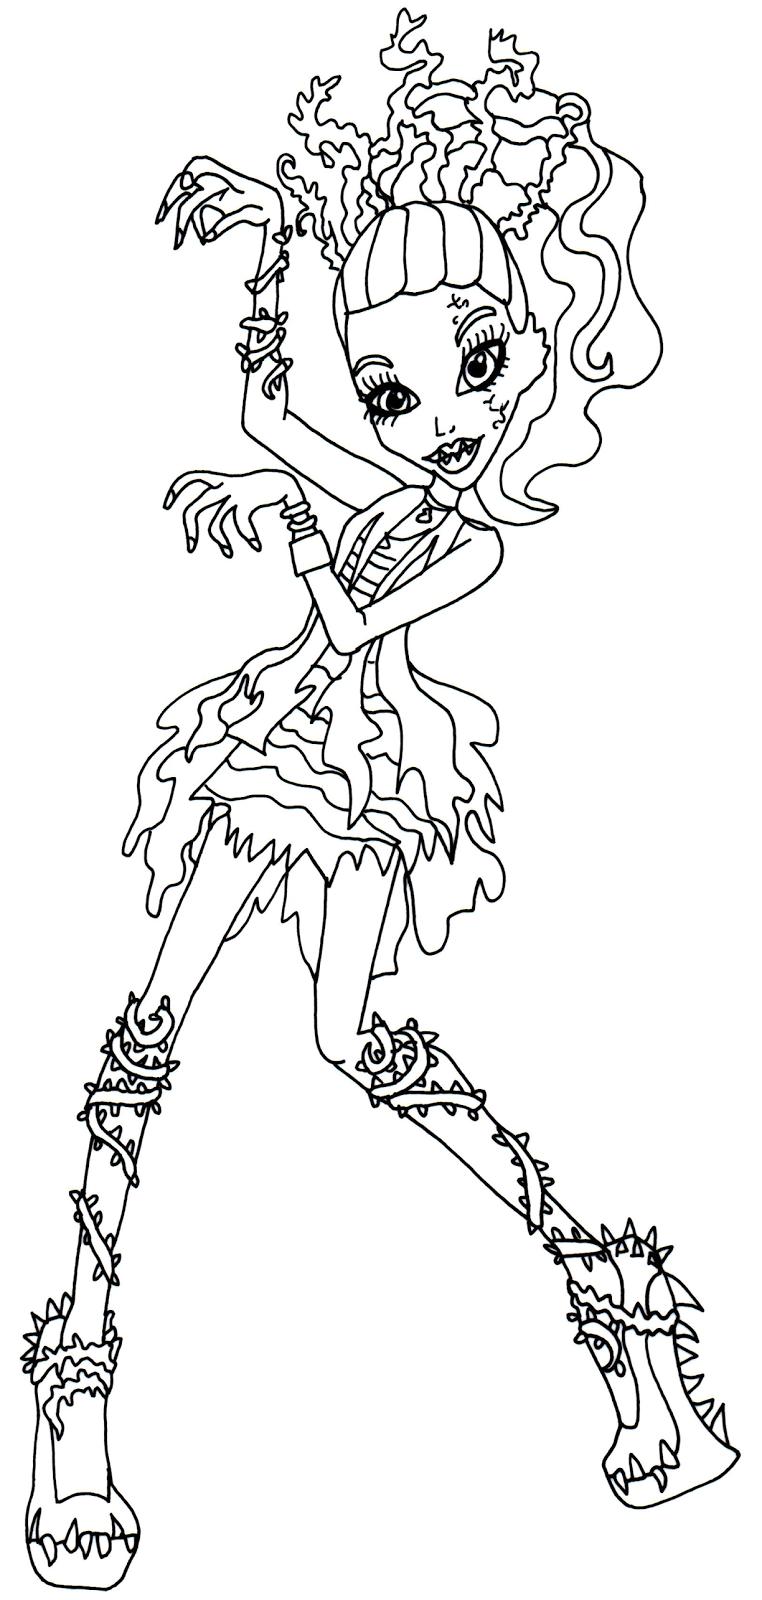 Monster High Ausmalbilder Cleo De Nile : Fantastisch Monster Hoch Malvorlagen Venus Mcflytrap Galerie